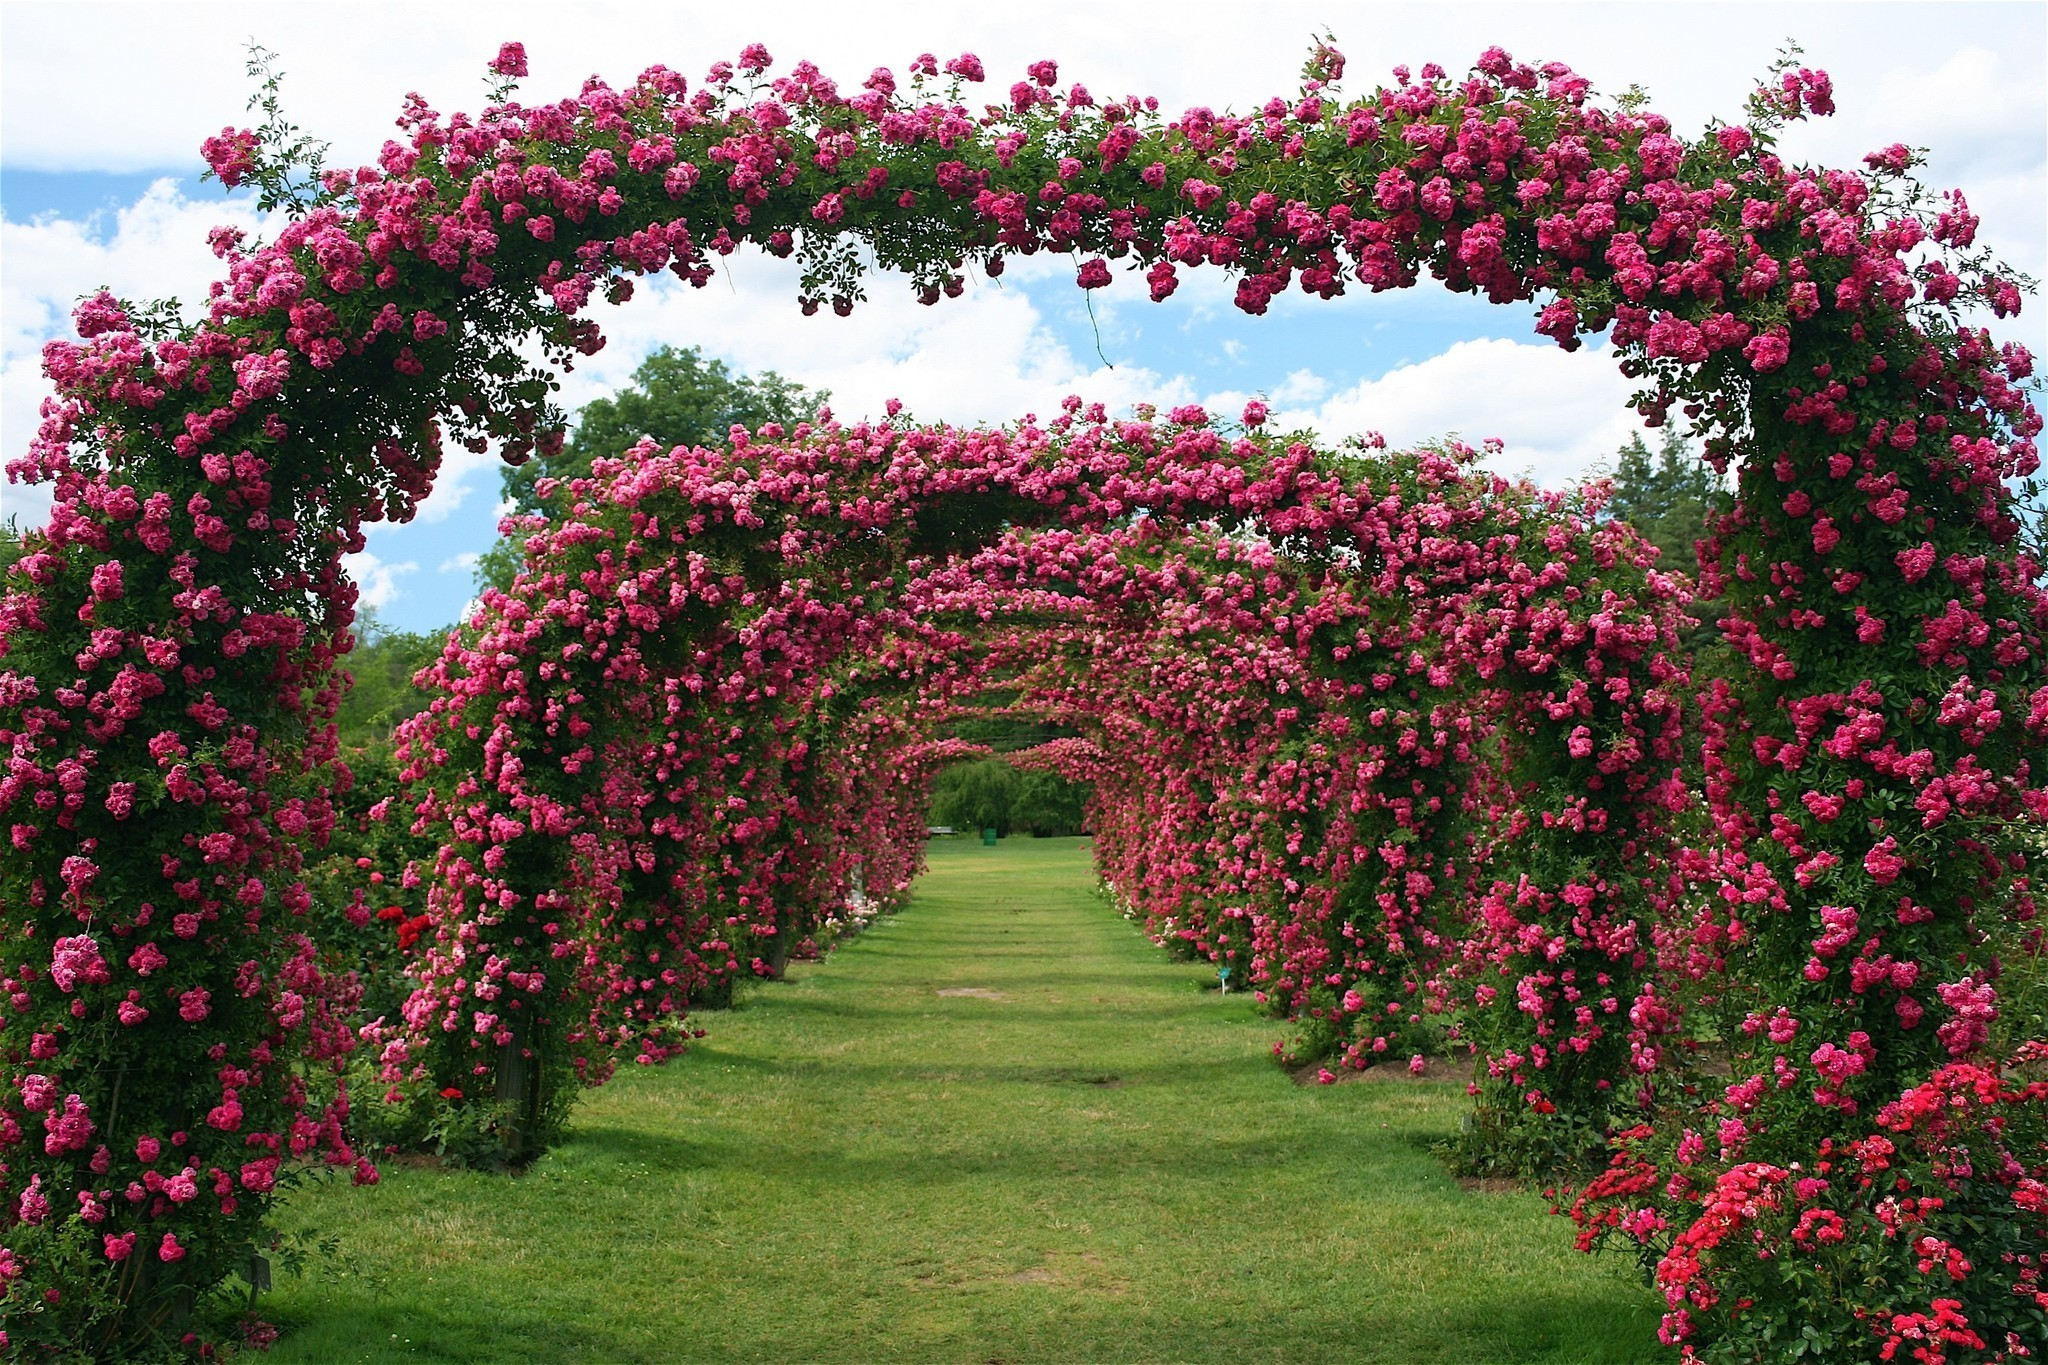 Roses In Garden: Write Stuff: Local Author Fest In Avon; Free Rose Garden